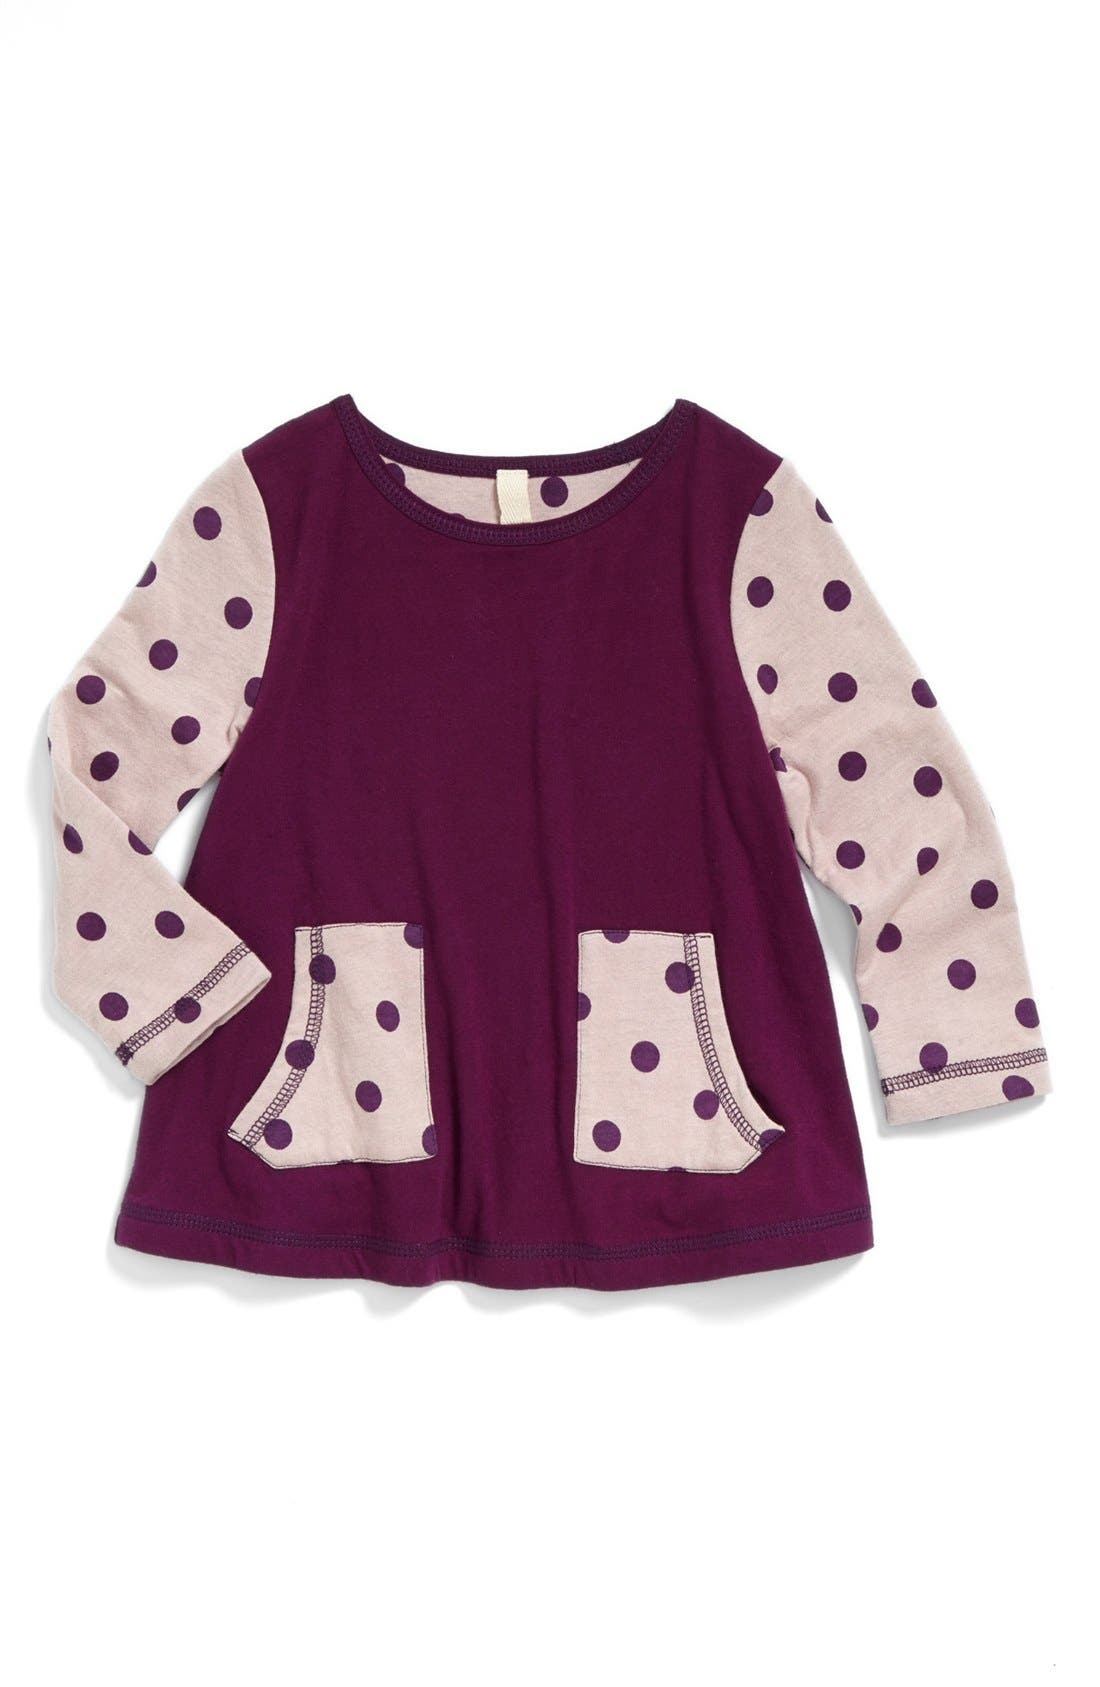 Alternate Image 1 Selected - Tucker + Tate 'Steph' Organic Cotton Tunic (Baby Girls)